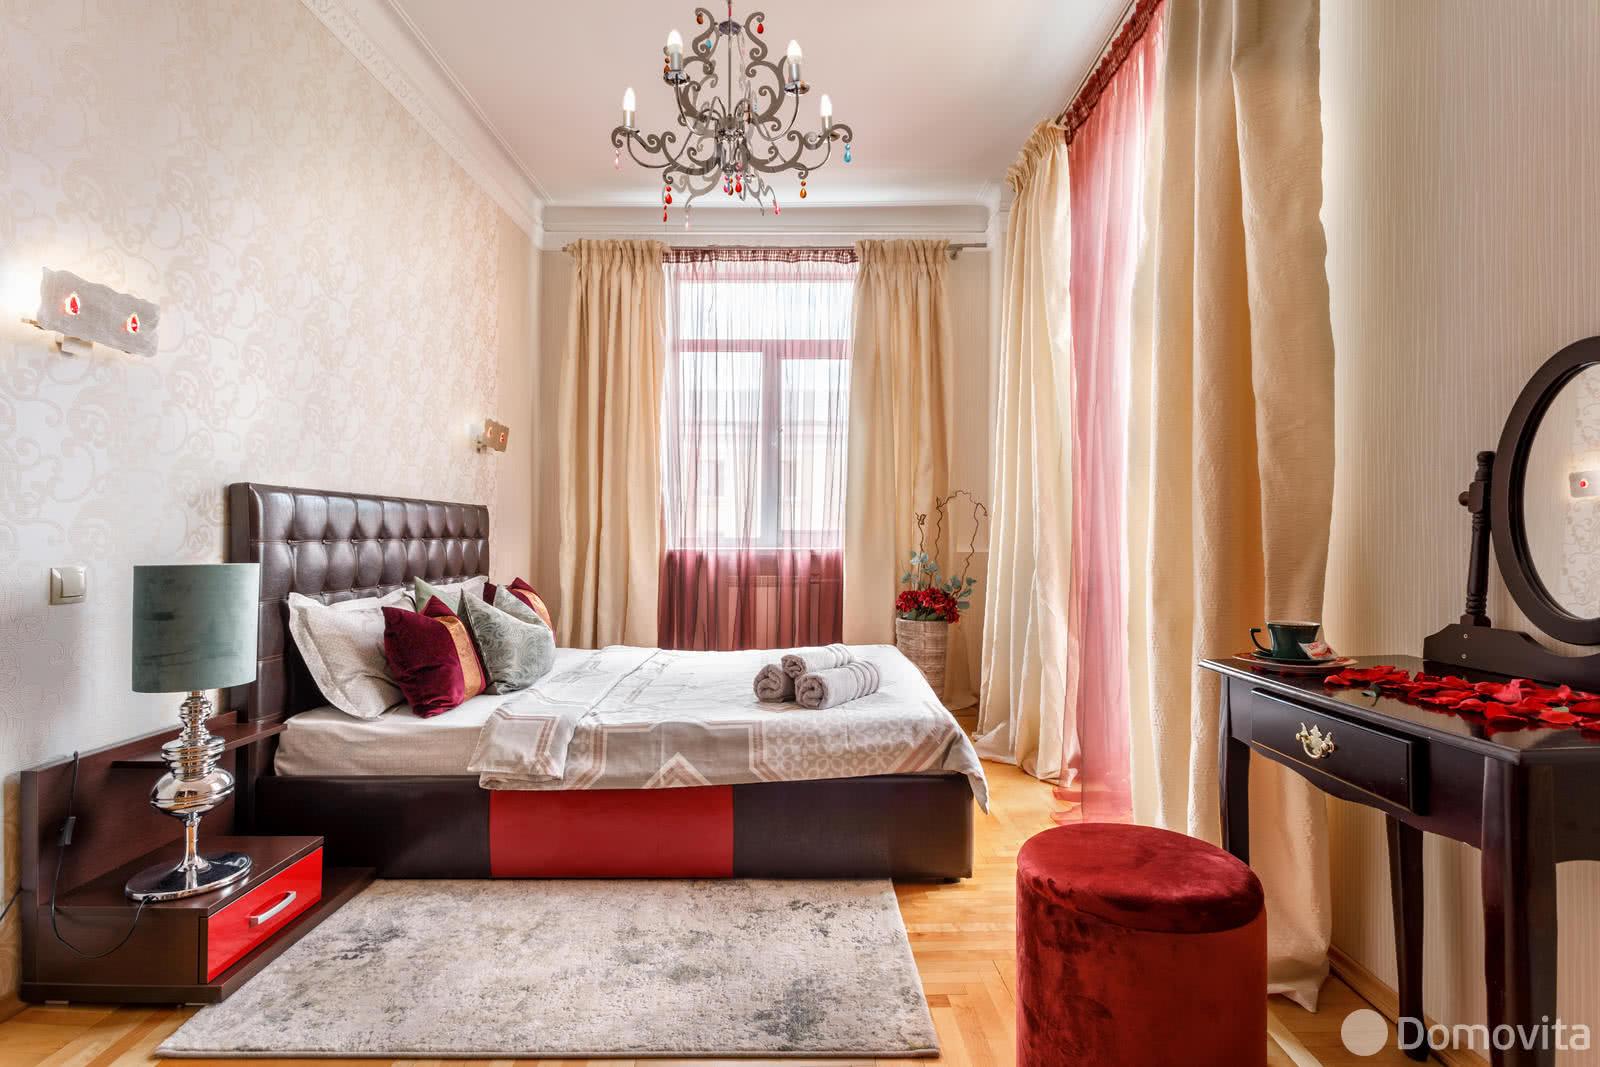 Аренда 2-комнатной квартиры на сутки в Минске ул. Красная, д. 18 - фото 5